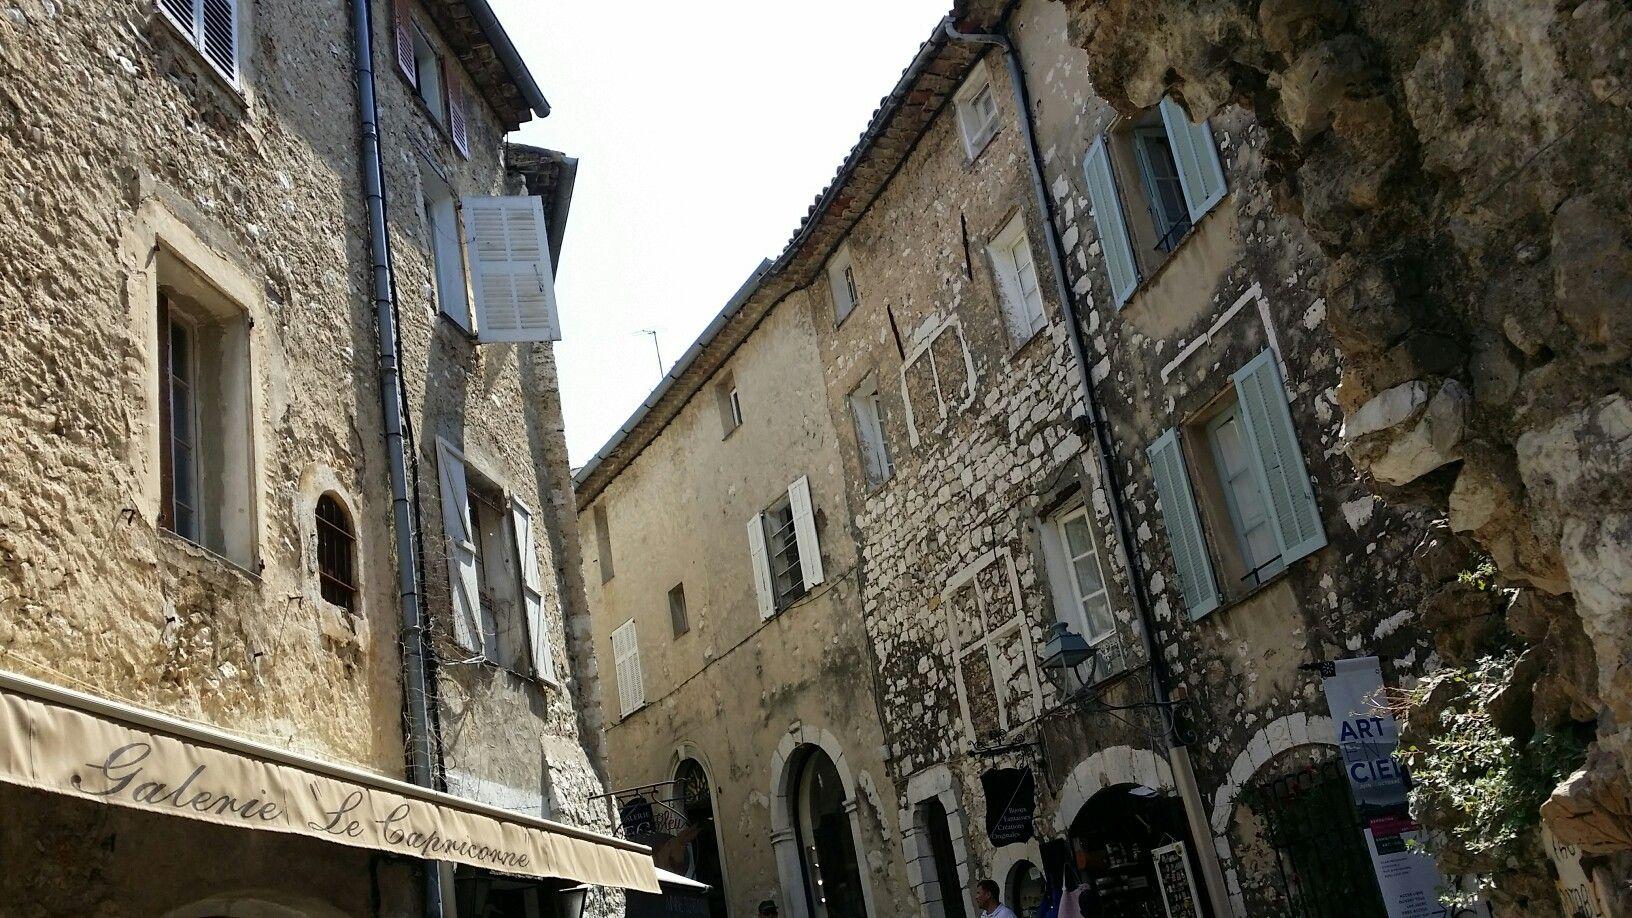 Old houses in Saint Paul de Vence. Provence. France